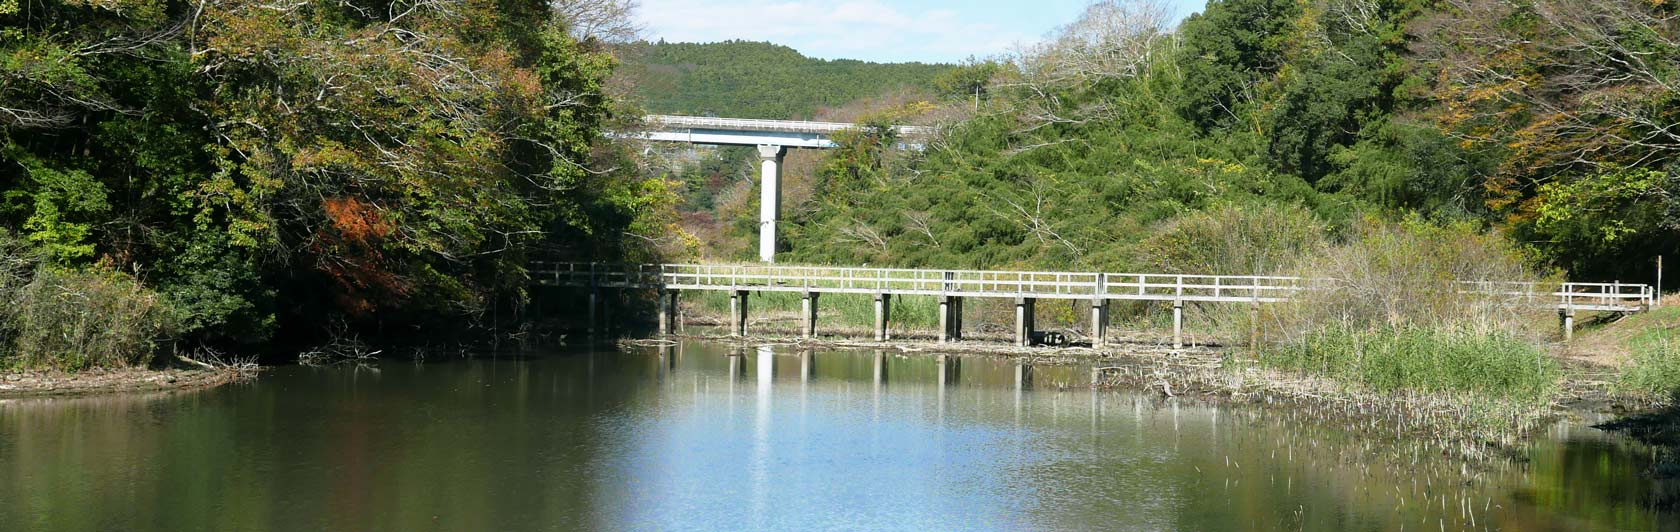 亀山湖の水辺公園